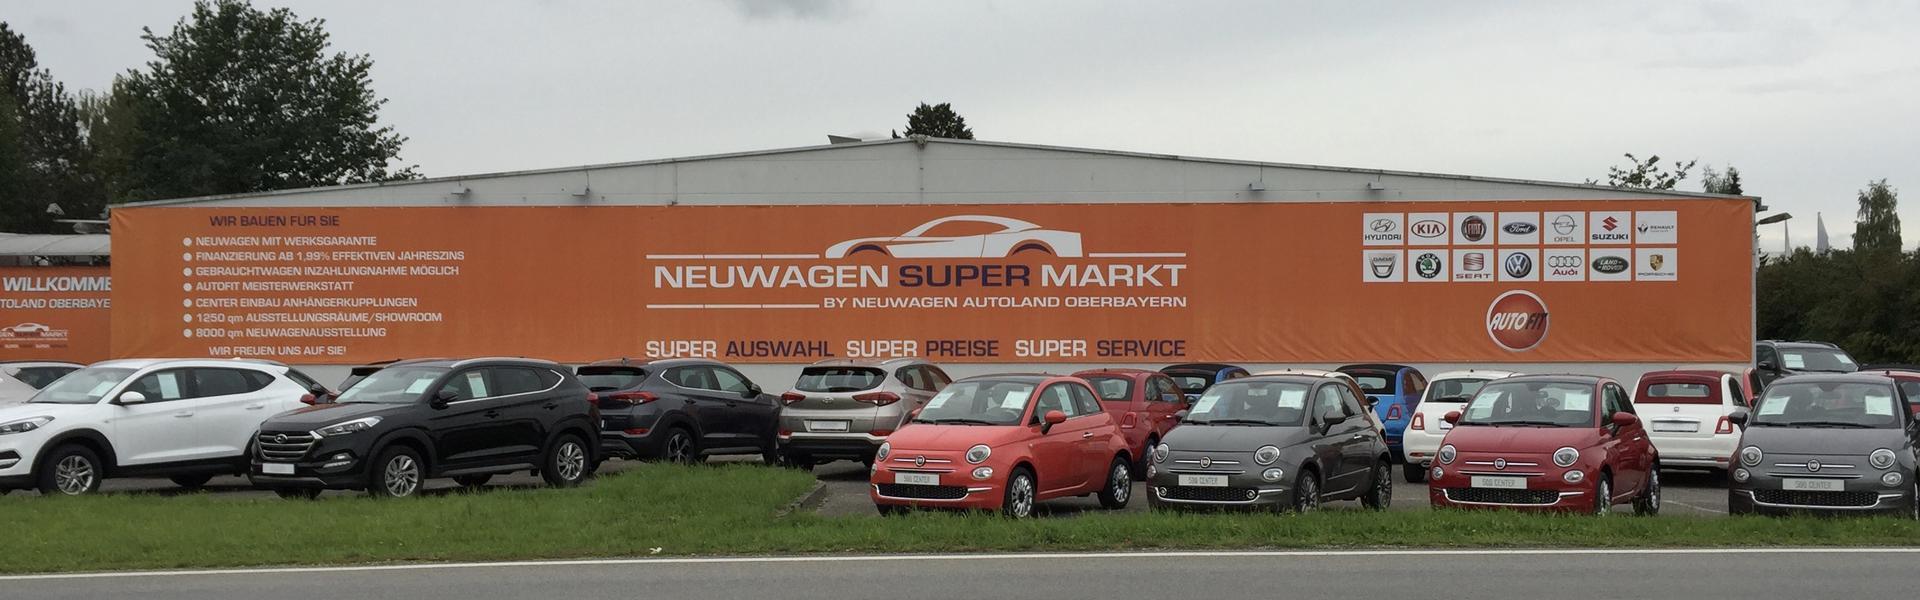 Neuwagen Autoland Oberbayern GmbH & Co. KG 94060 Pocking - Gewerbering 6 - 48 bei Passau